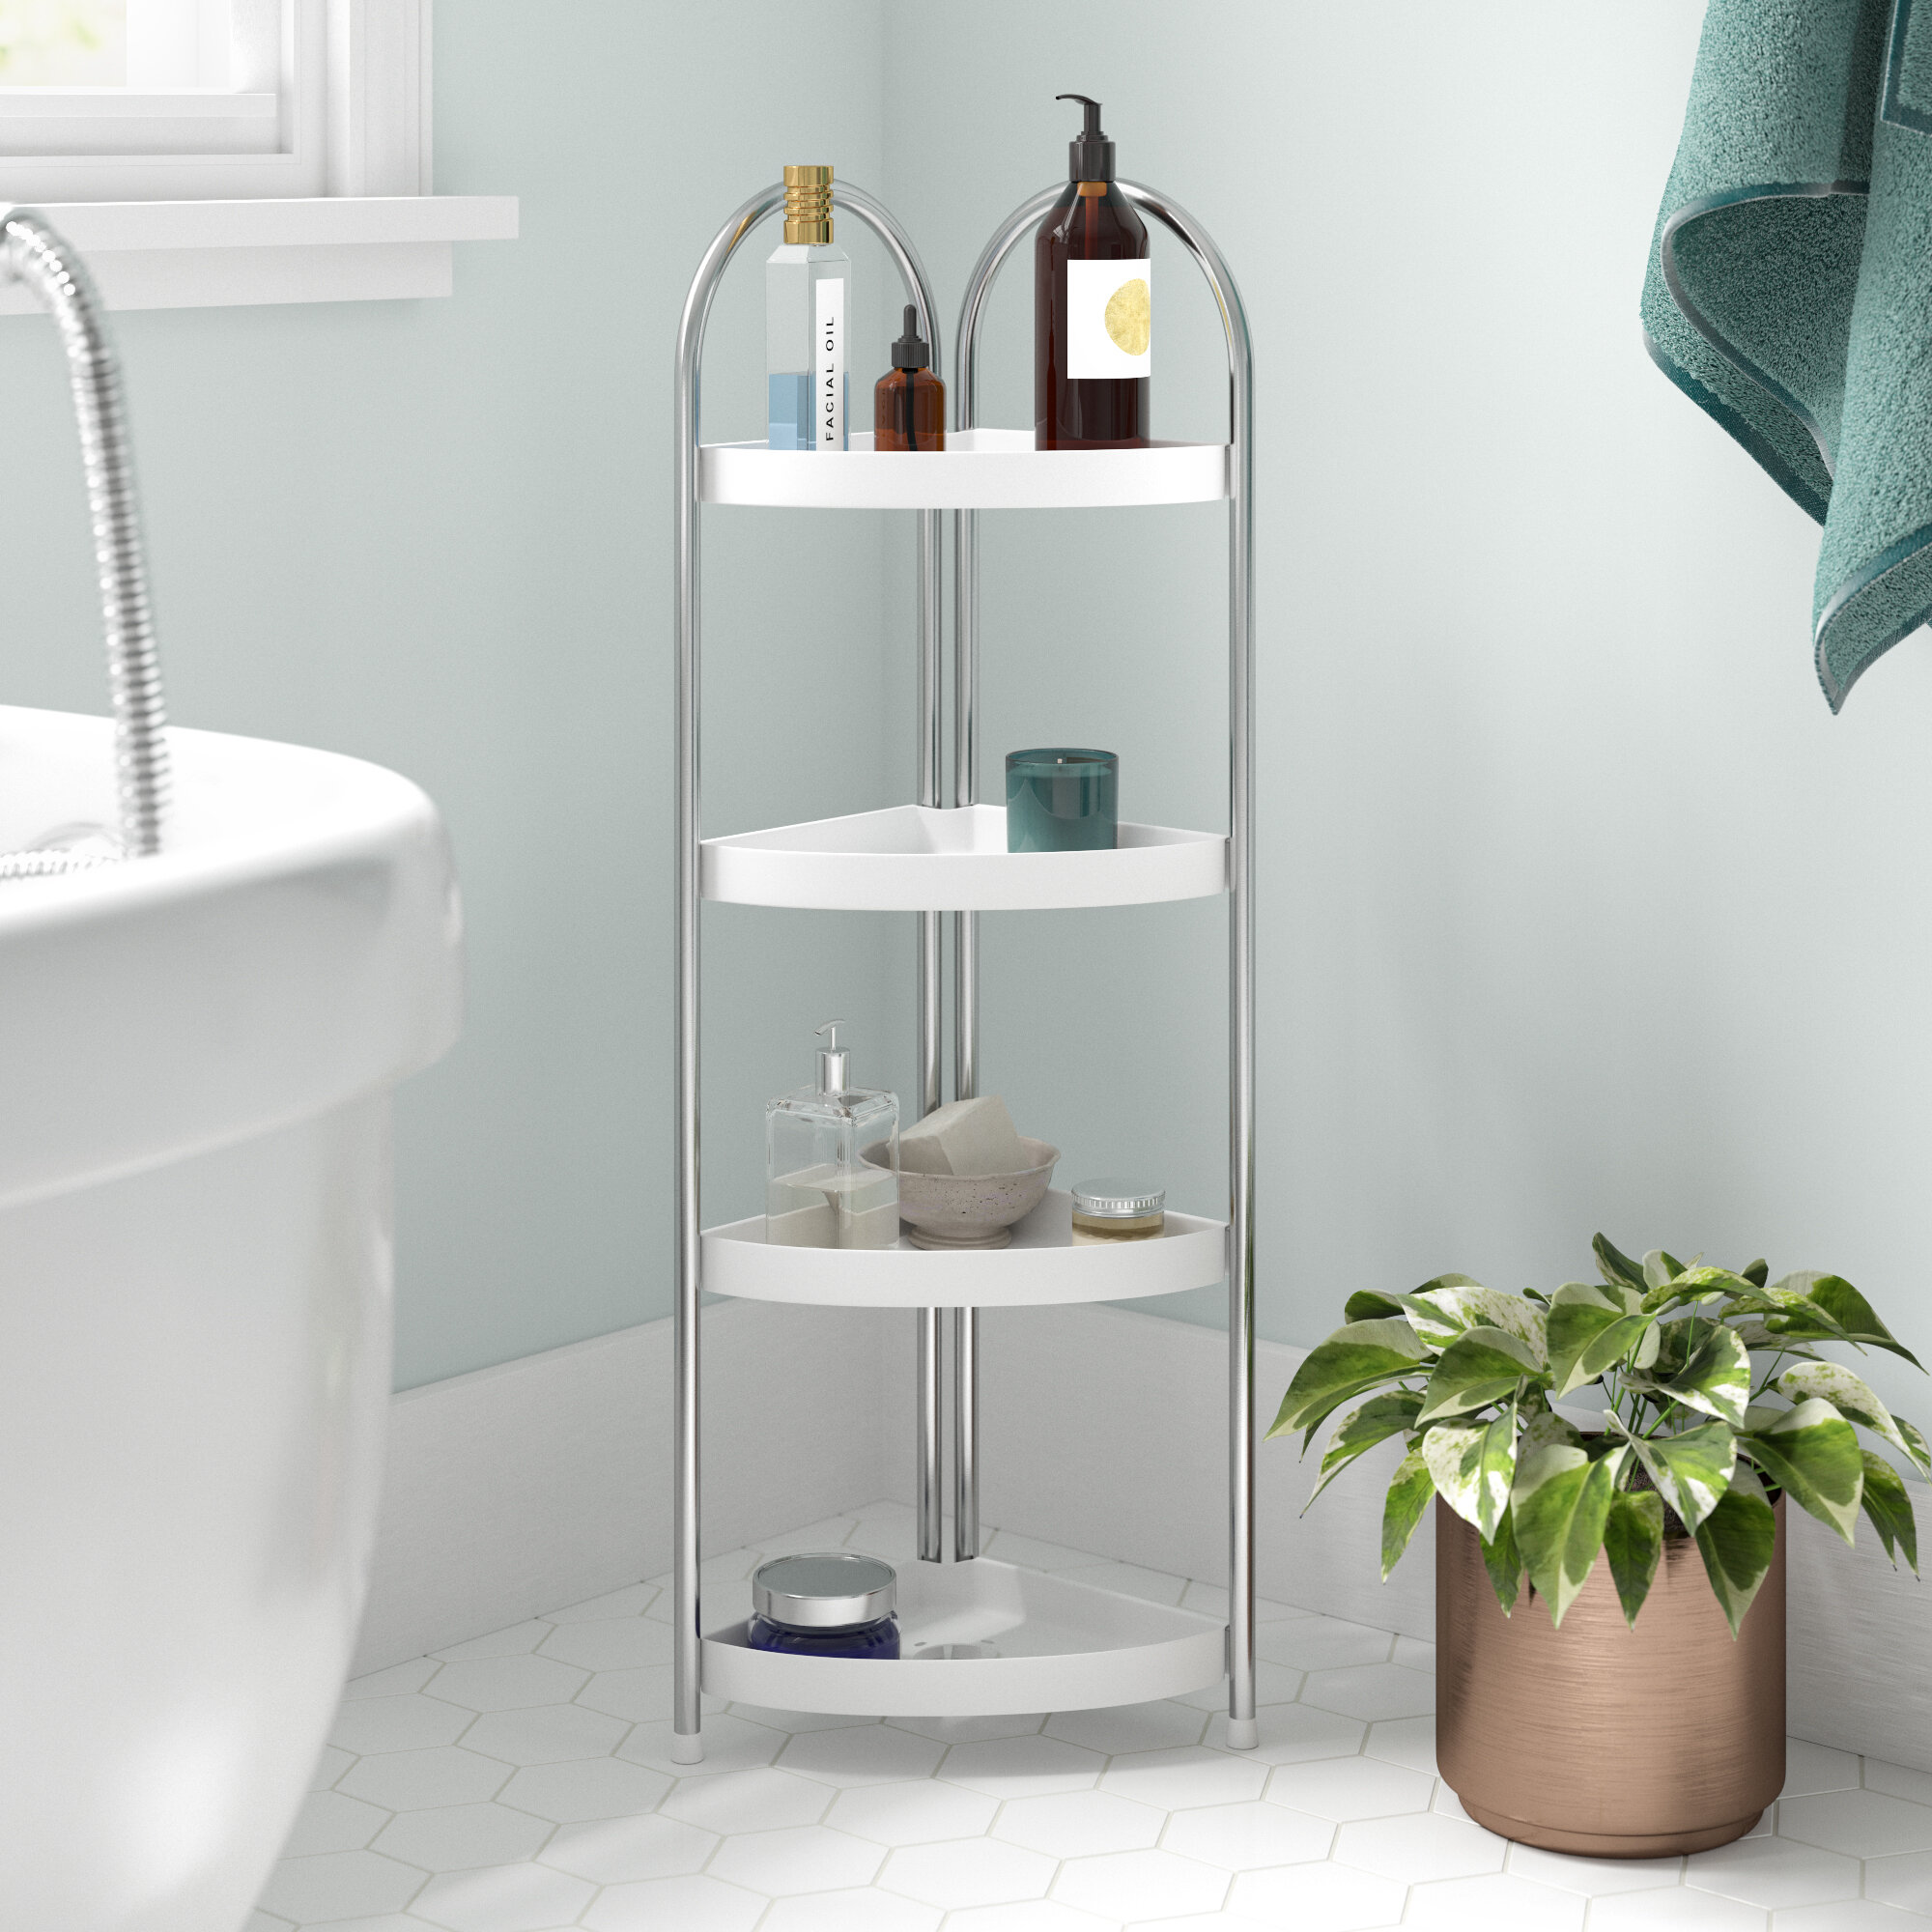 4 Tier Corner Bathroom Shelf Unit